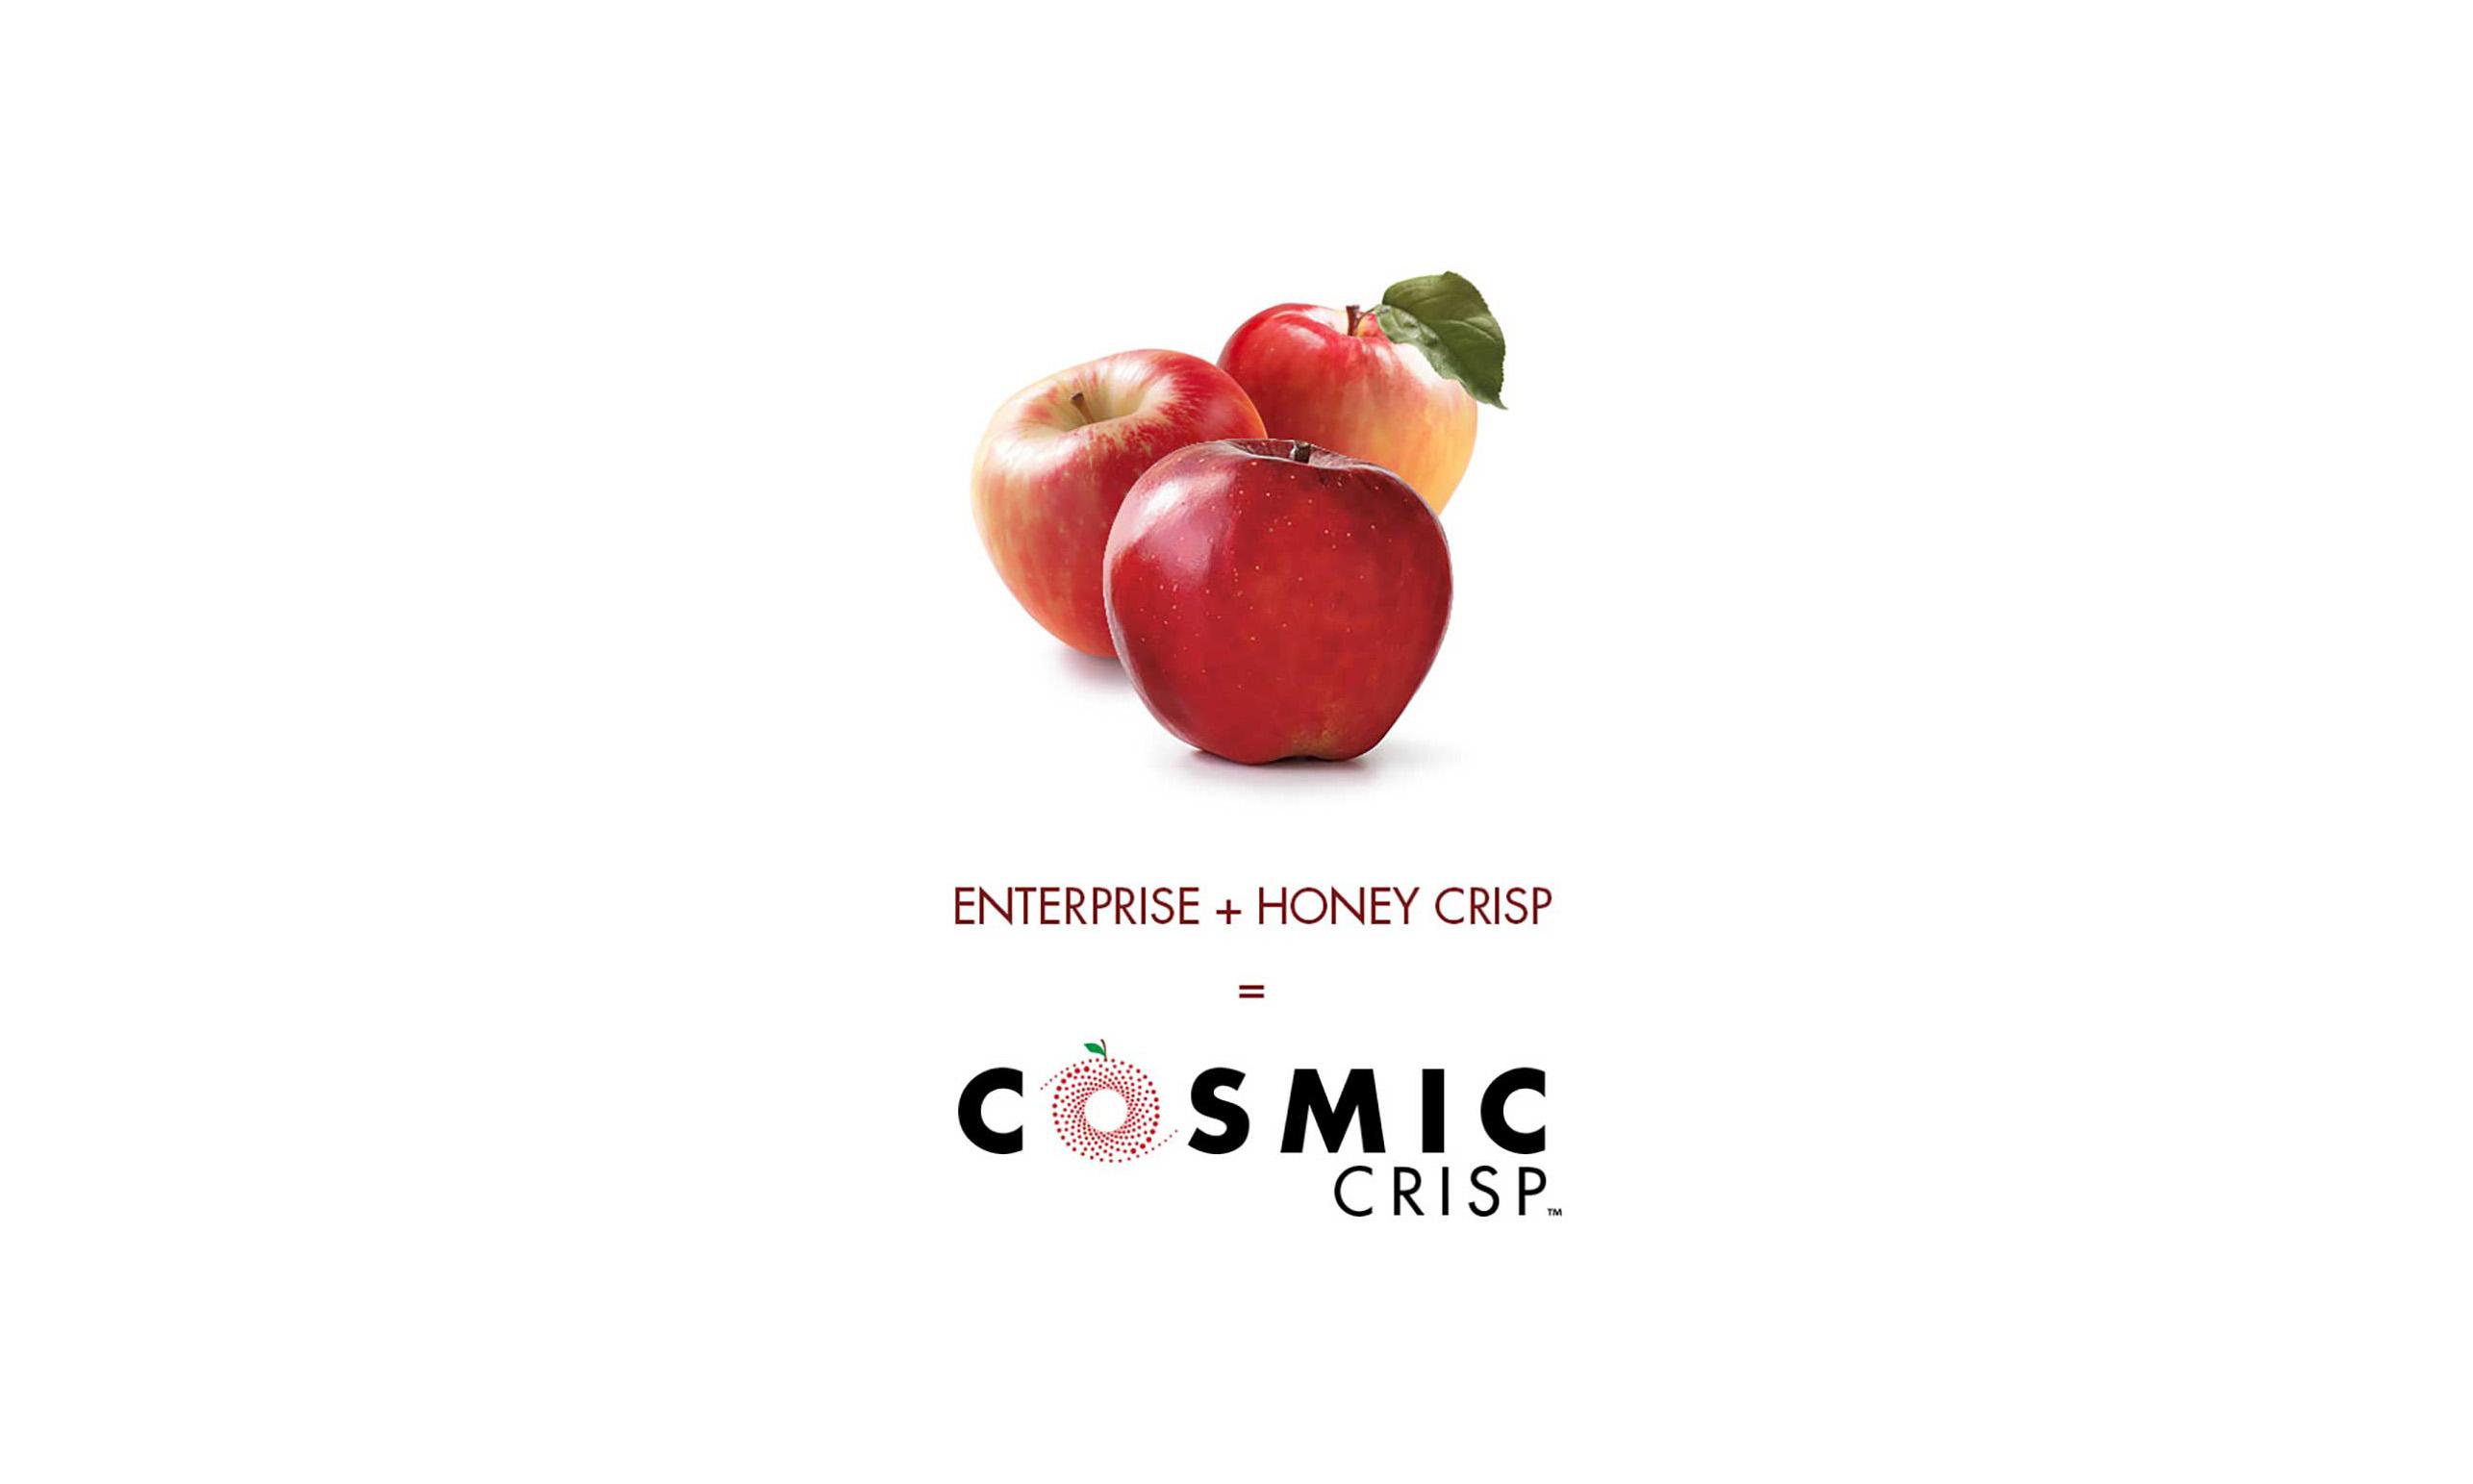 A Cosmic Crisp marketing poster